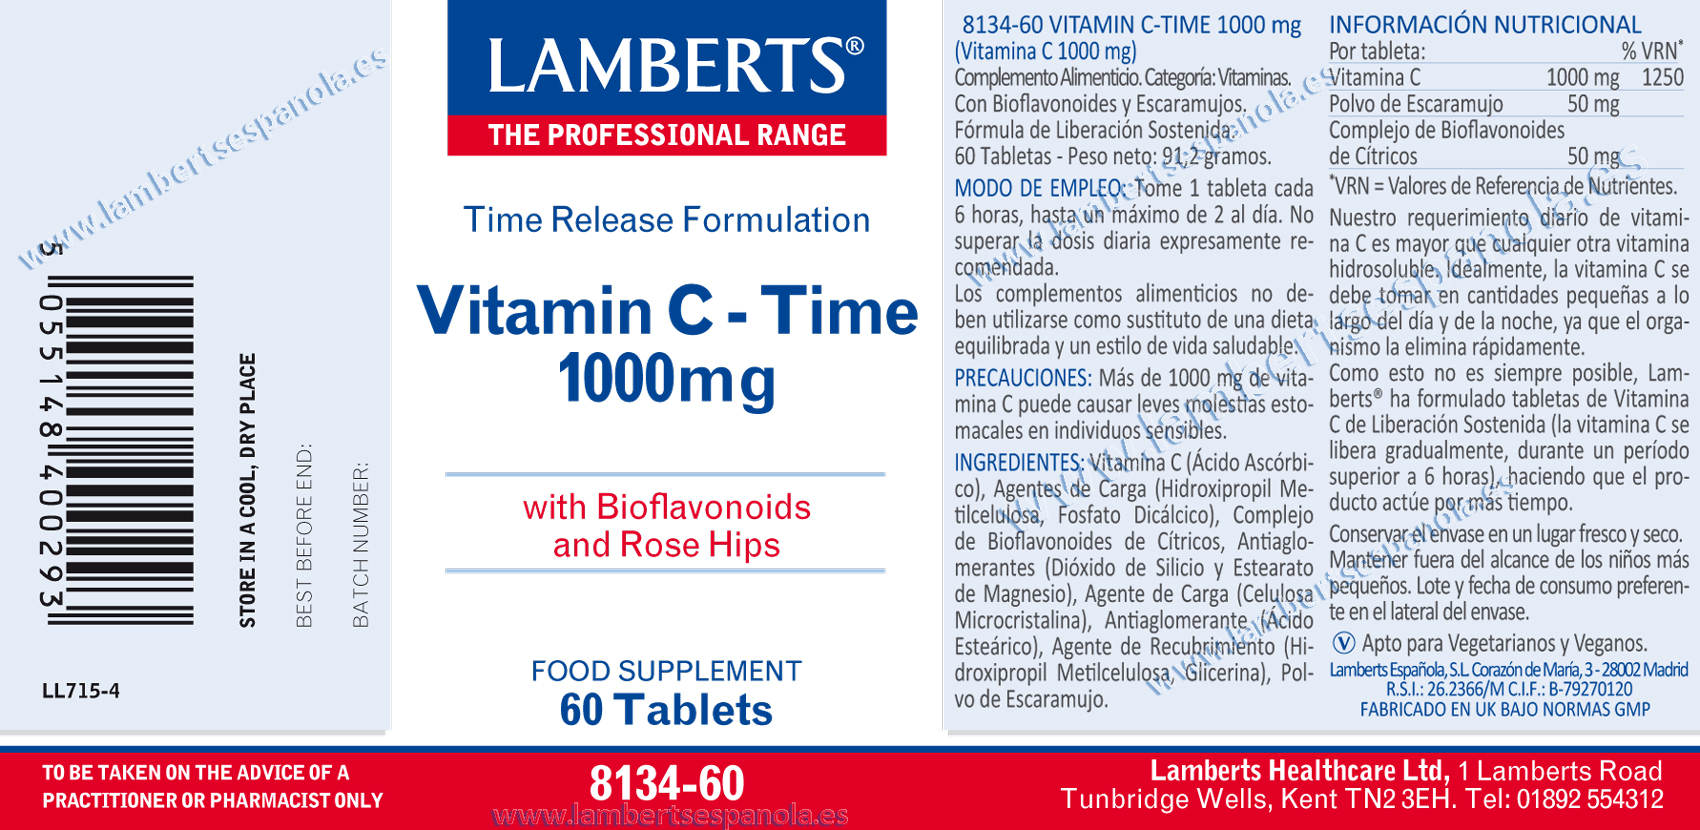 Vitamina C 1000 de liberación sostenida